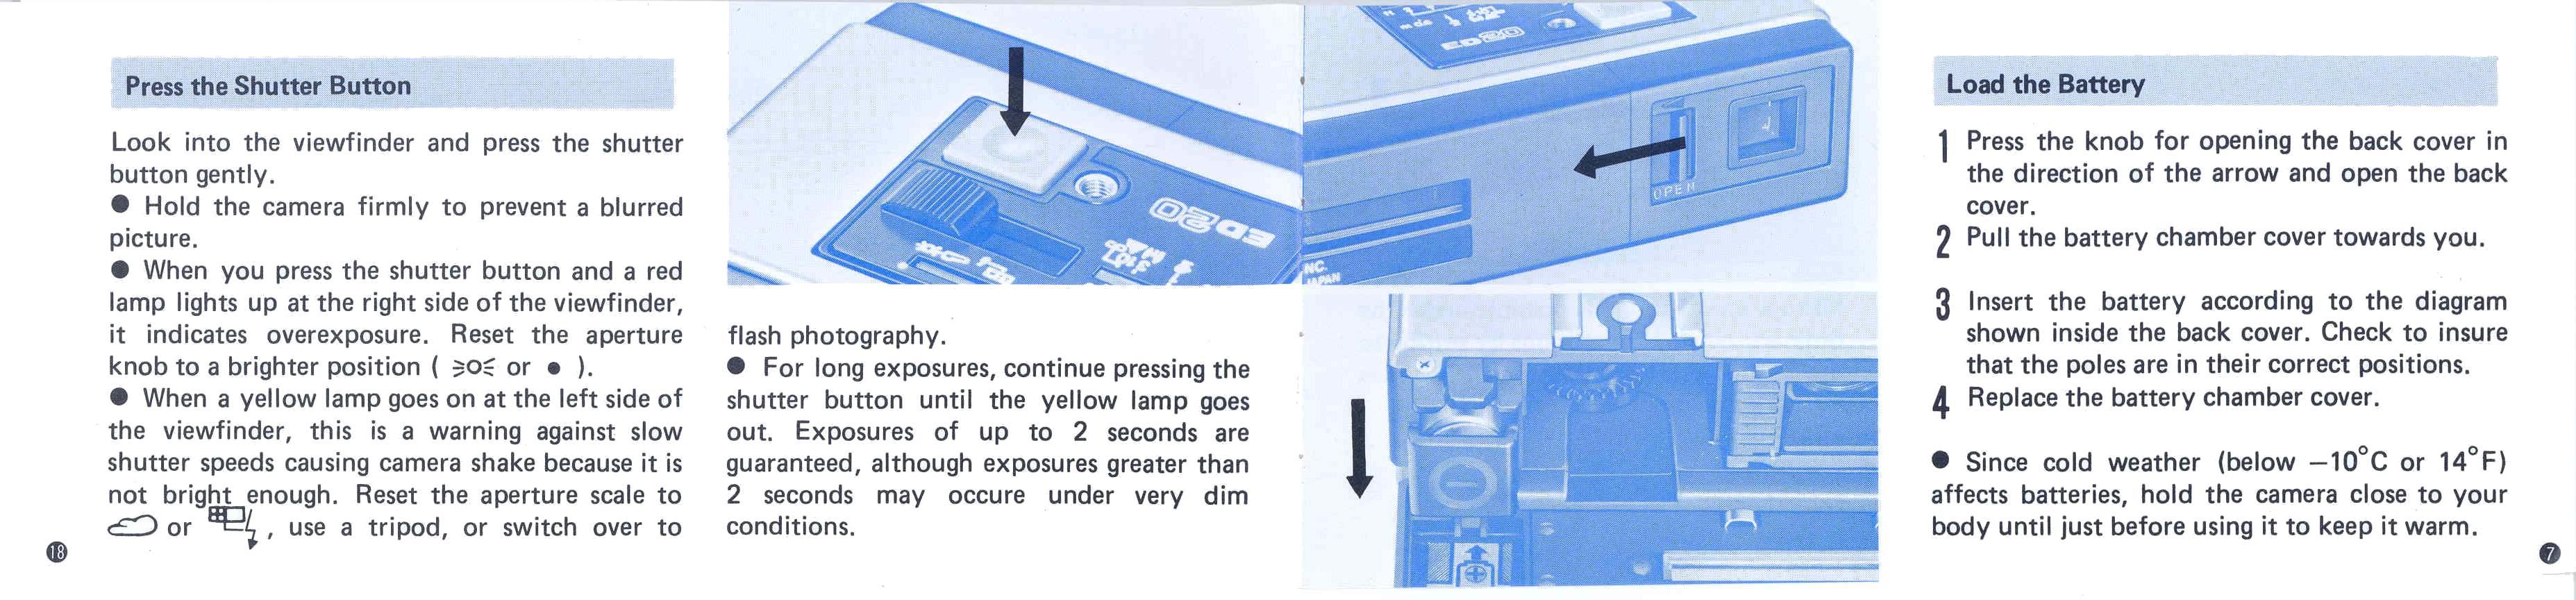 Canon 110 Canolite Ed Manual